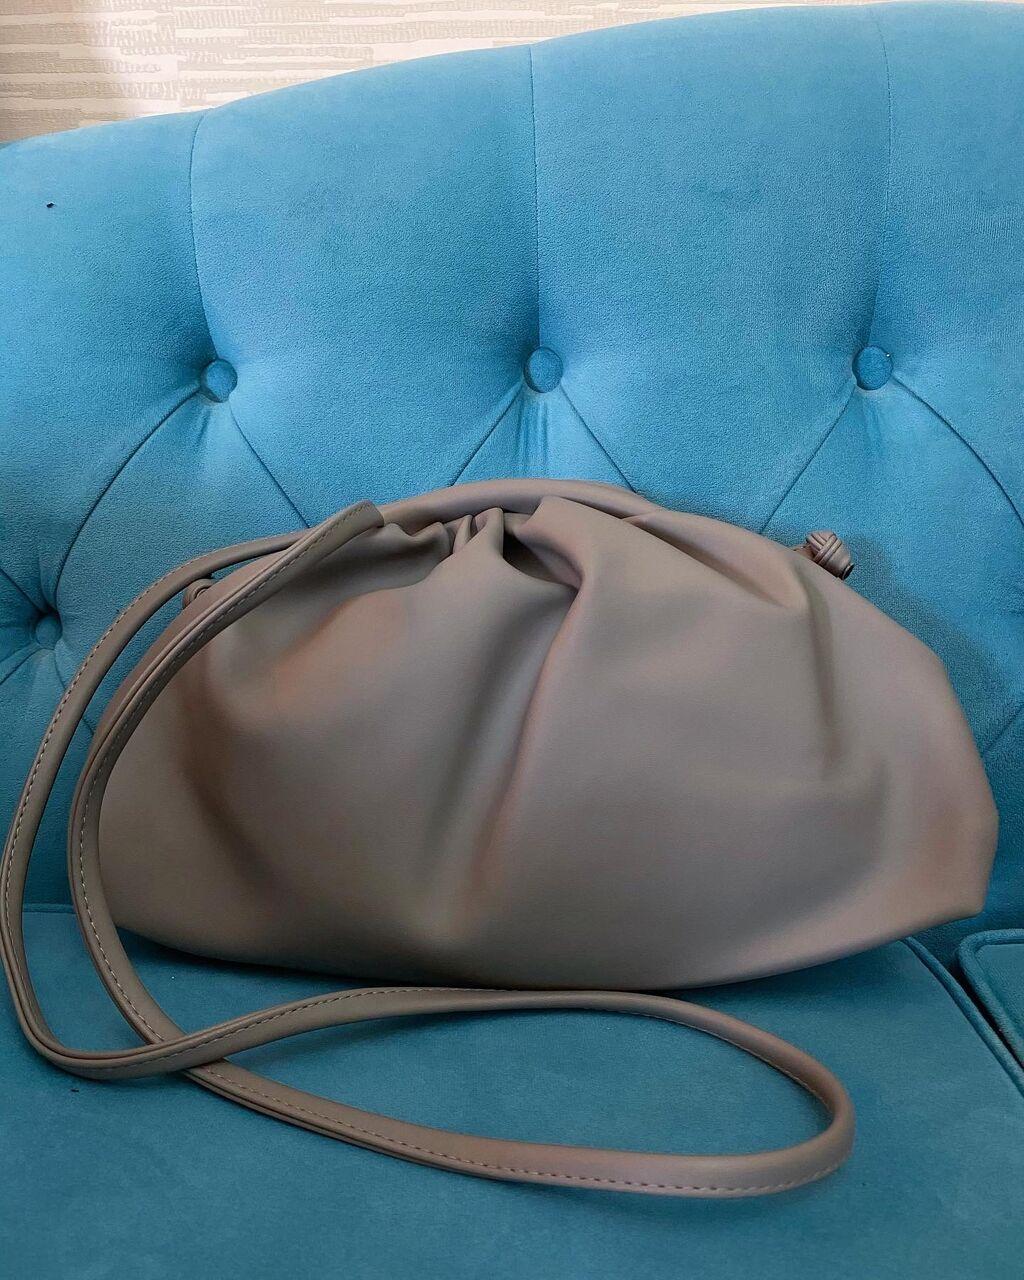 Новая сумка Турция: Новая сумка Турция